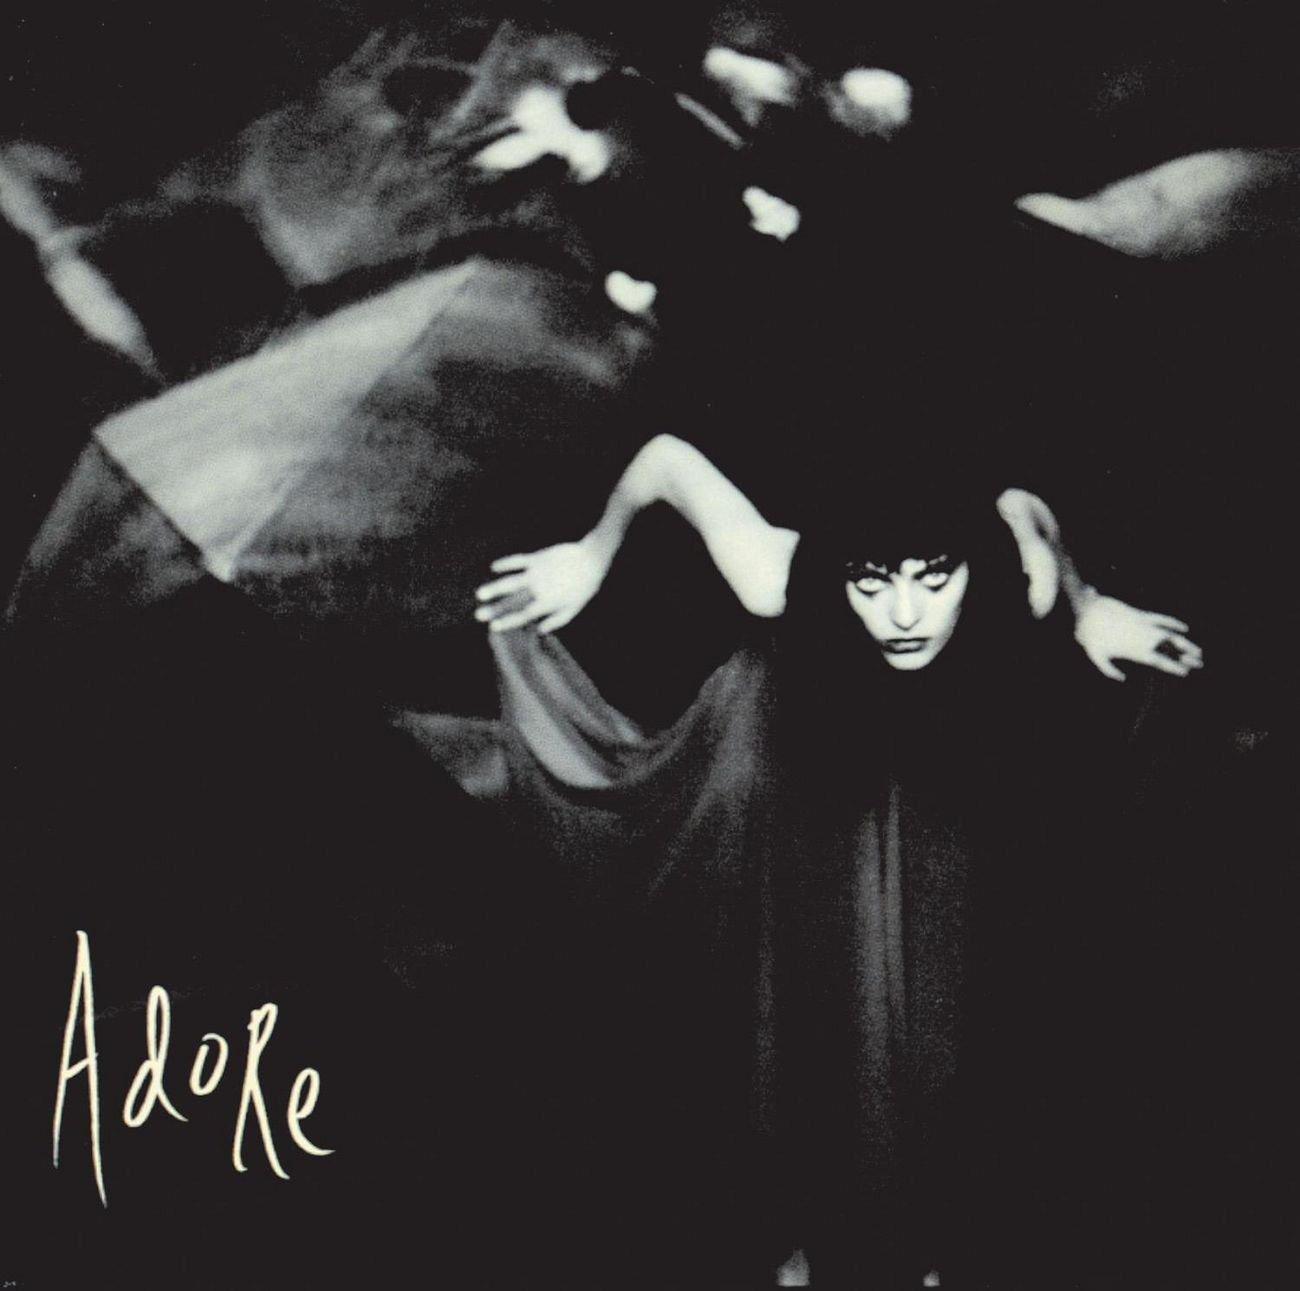 Adore by Virgin